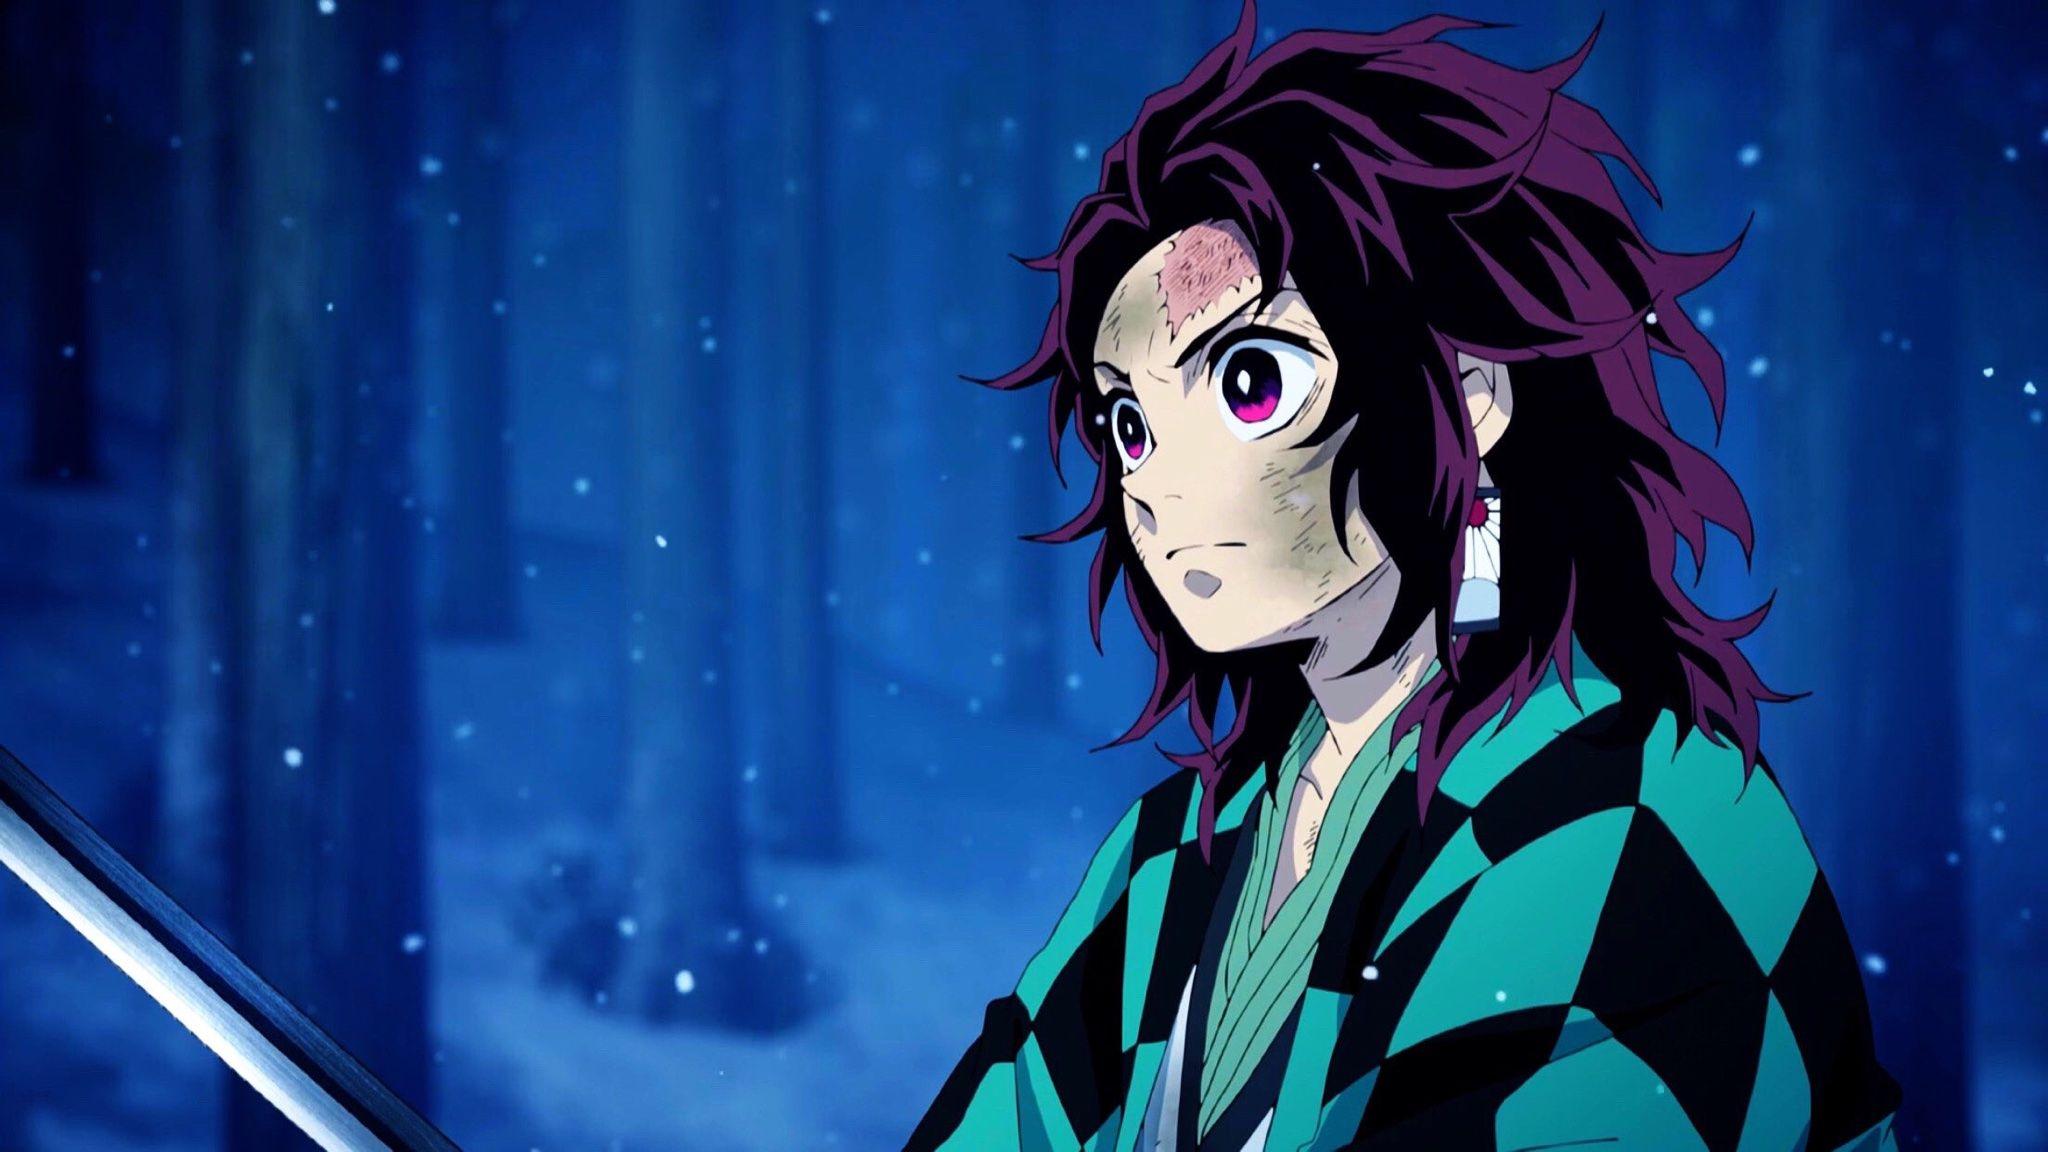 Demon Slayer On Twitter In 2021 Anime Anime Demon Demon